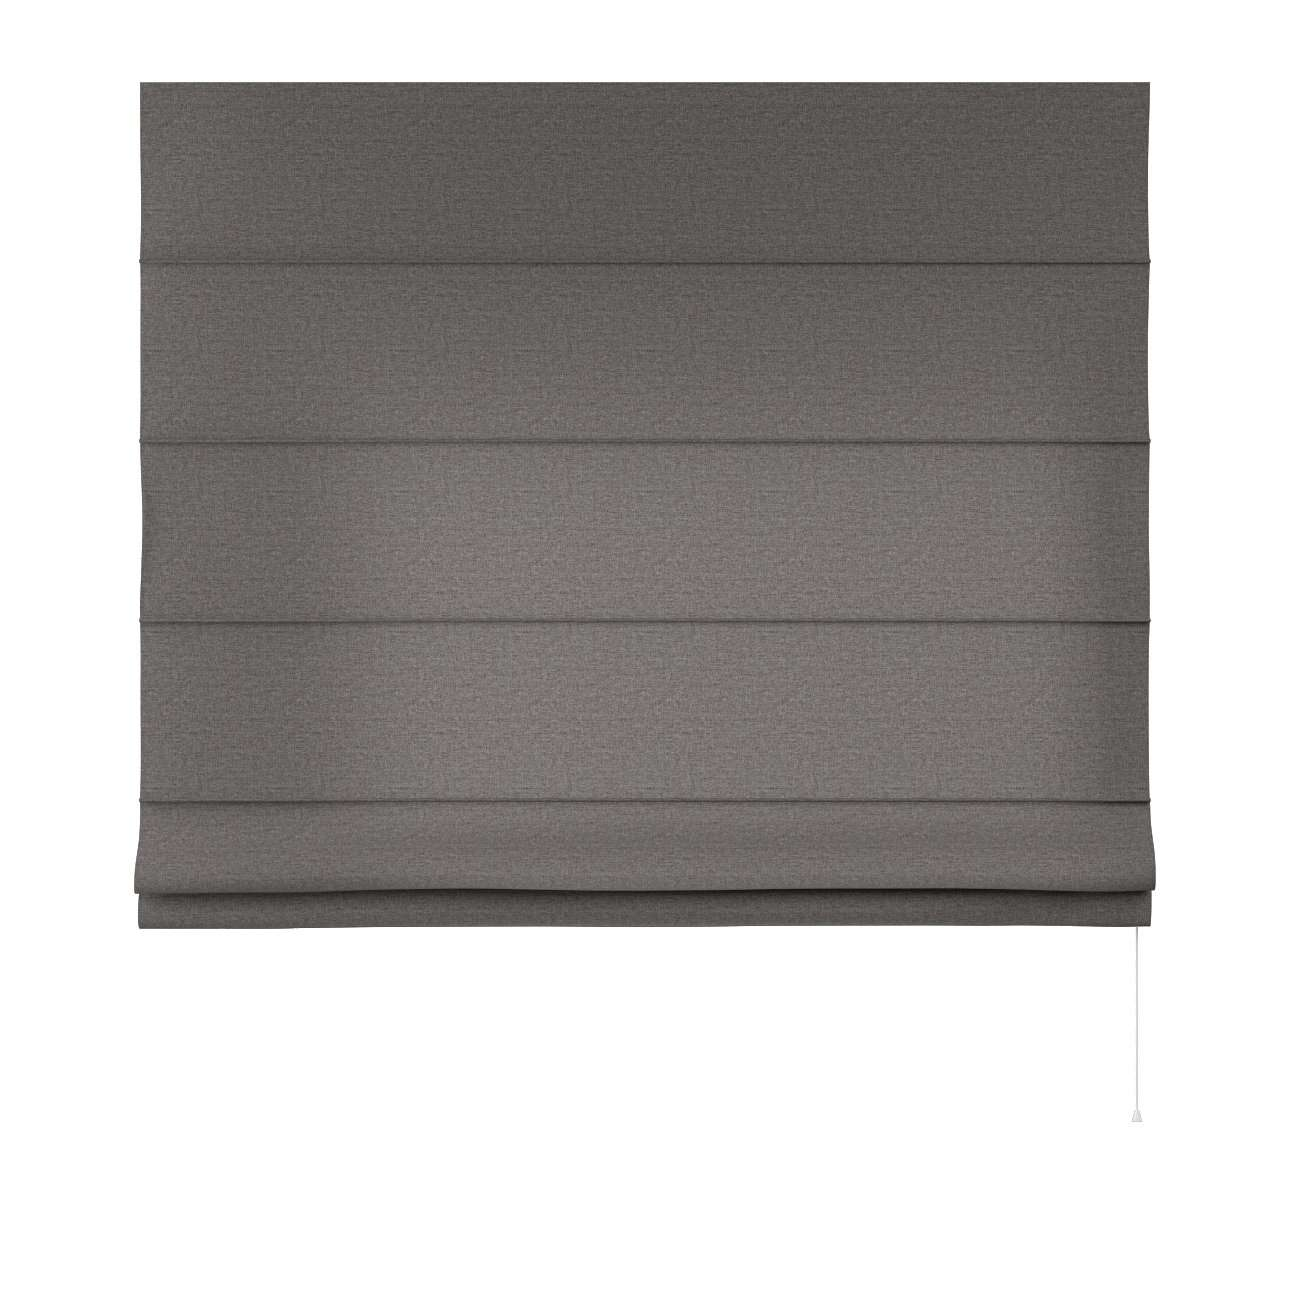 Romanetės Capri 80 x 170 cm (plotis x ilgis) kolekcijoje Edinburgh , audinys: 115-77